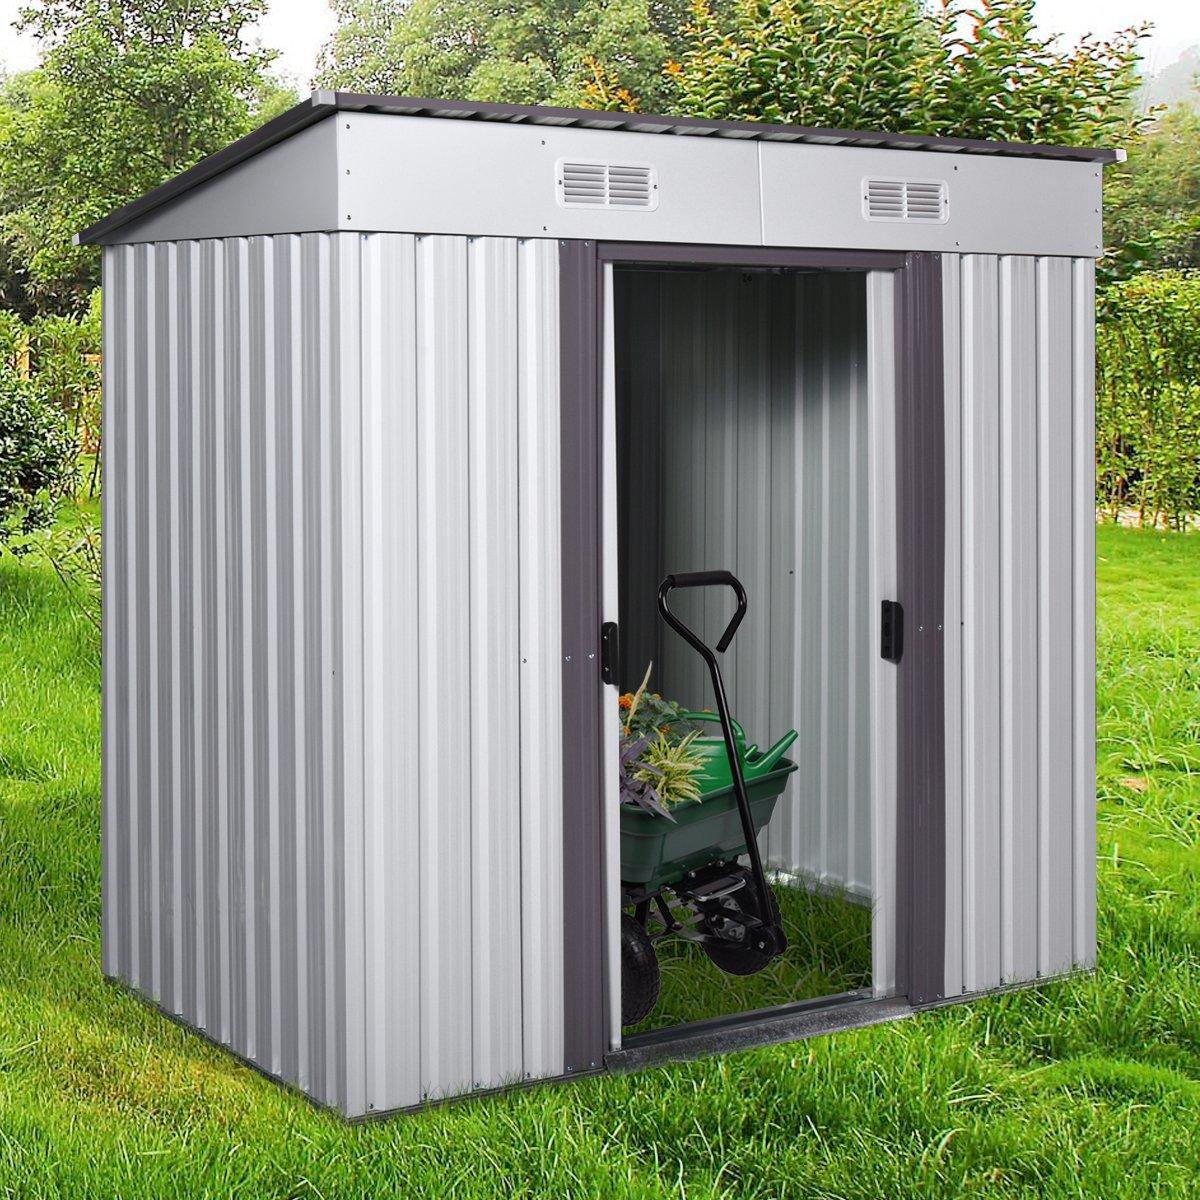 4' x 6' Metal Garden Storage Shed Utility Outdoor Backyard Lawn Tool House w/Sliding Door White and Warm Grey